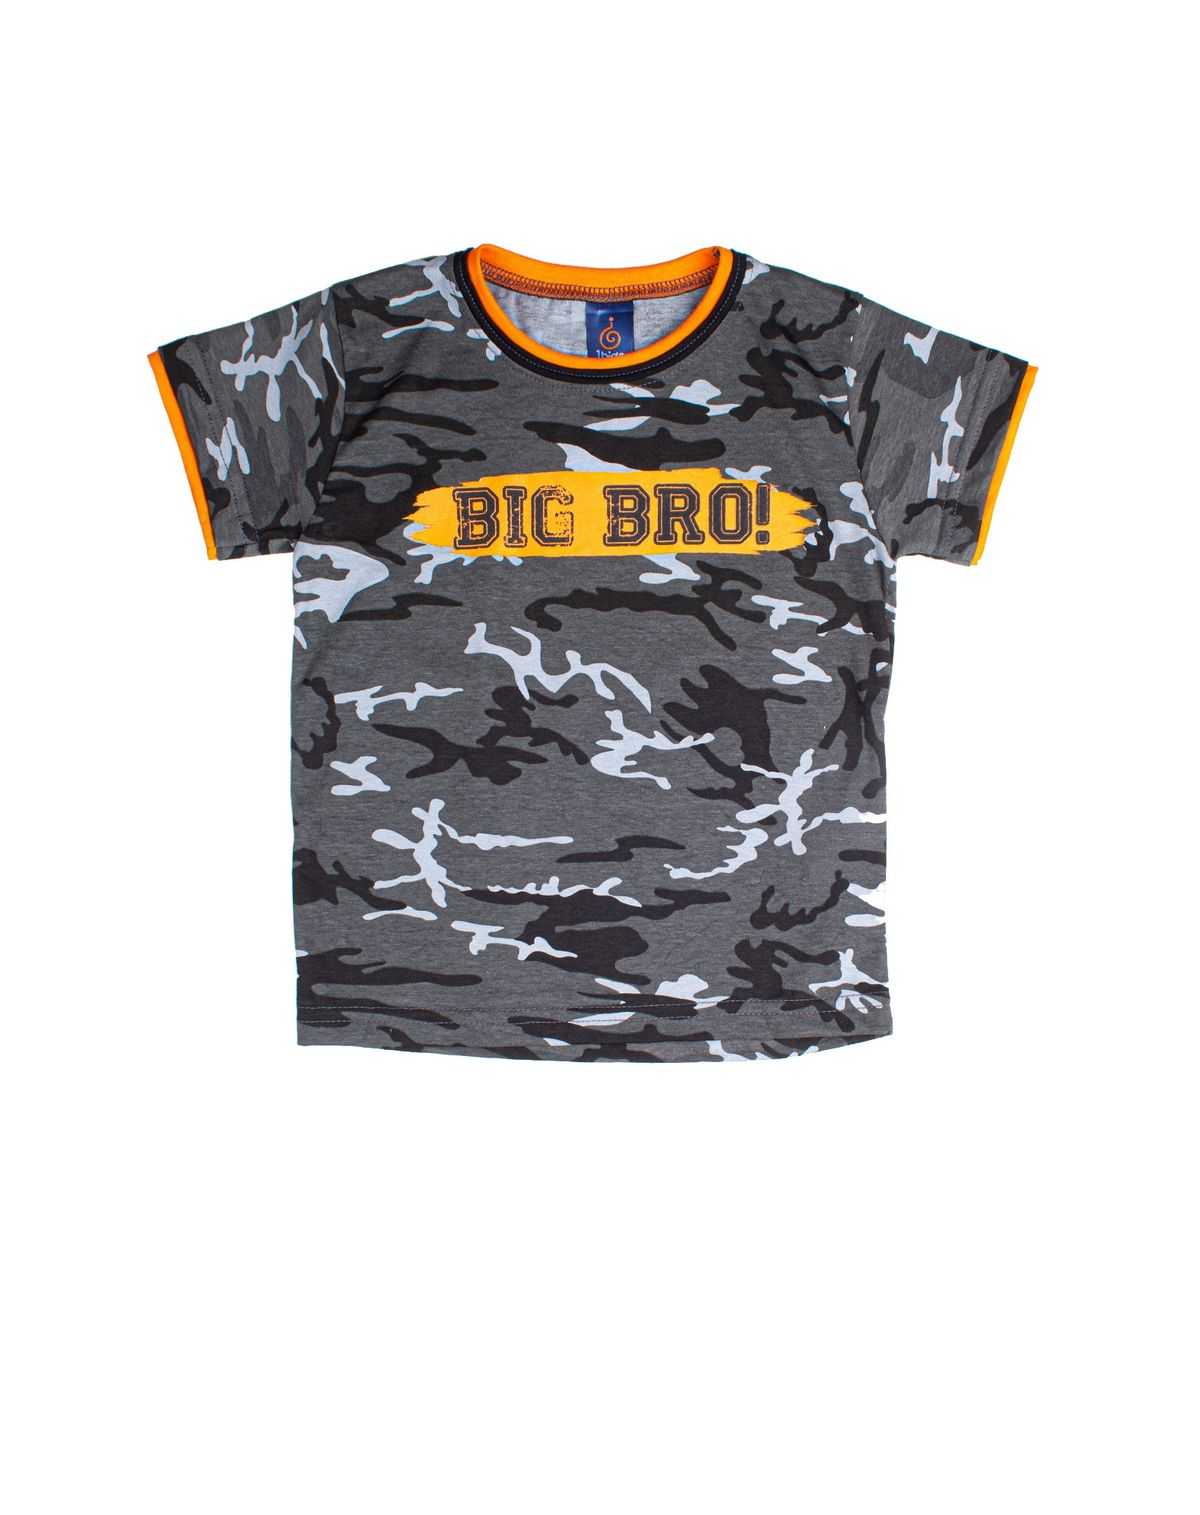 2050005681825-Camiseta-Manga-Curta-Bebe-Menino-Estampa-Camuflada-CHUMBO-2-1